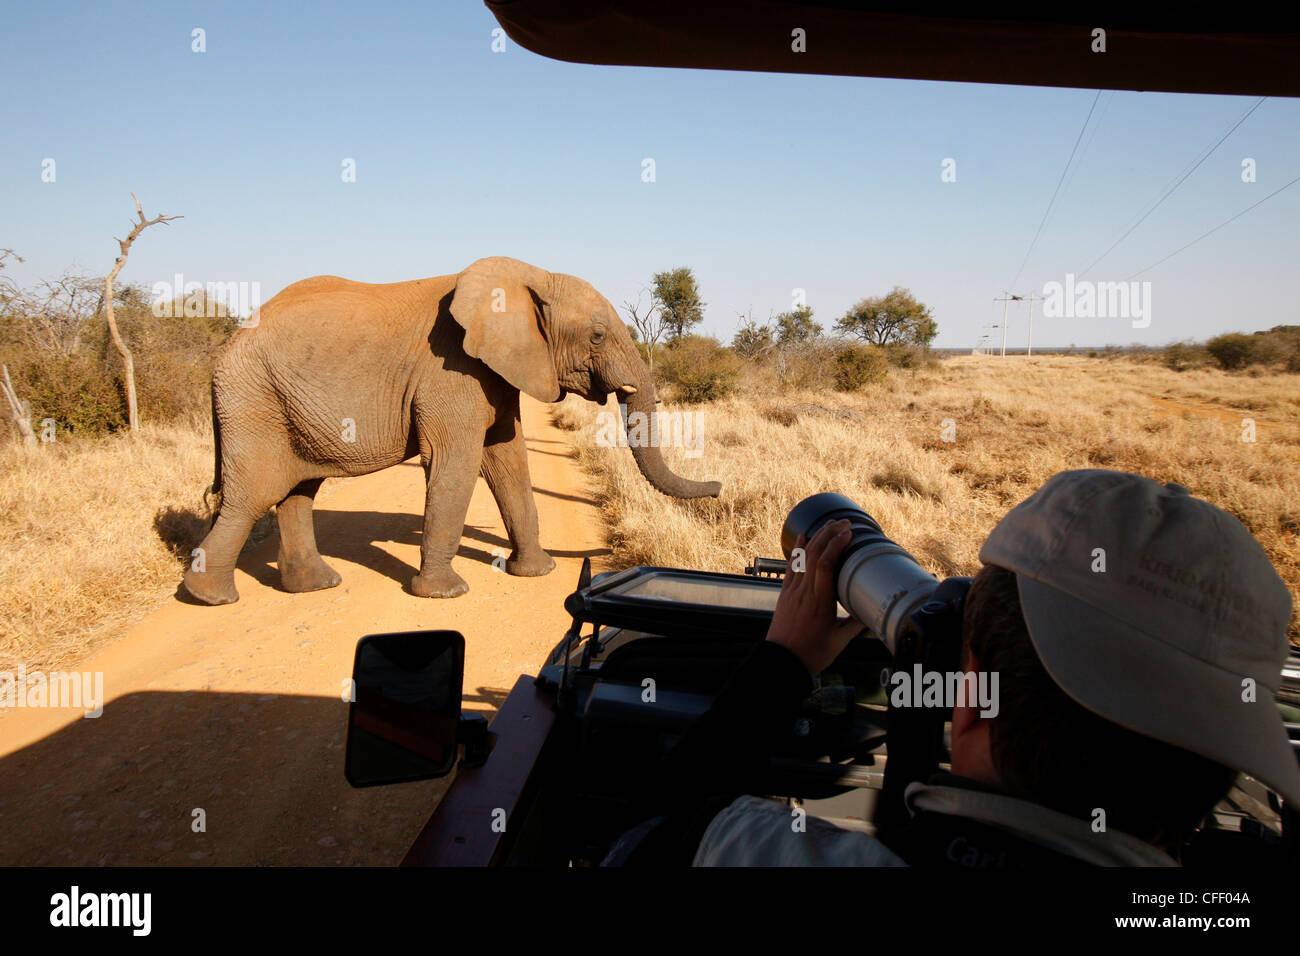 Elefante africano nella parte anteriore del veicolo di safari, Madikwe Game Reserve, Madikwe, Sud Africa e Africa Immagini Stock